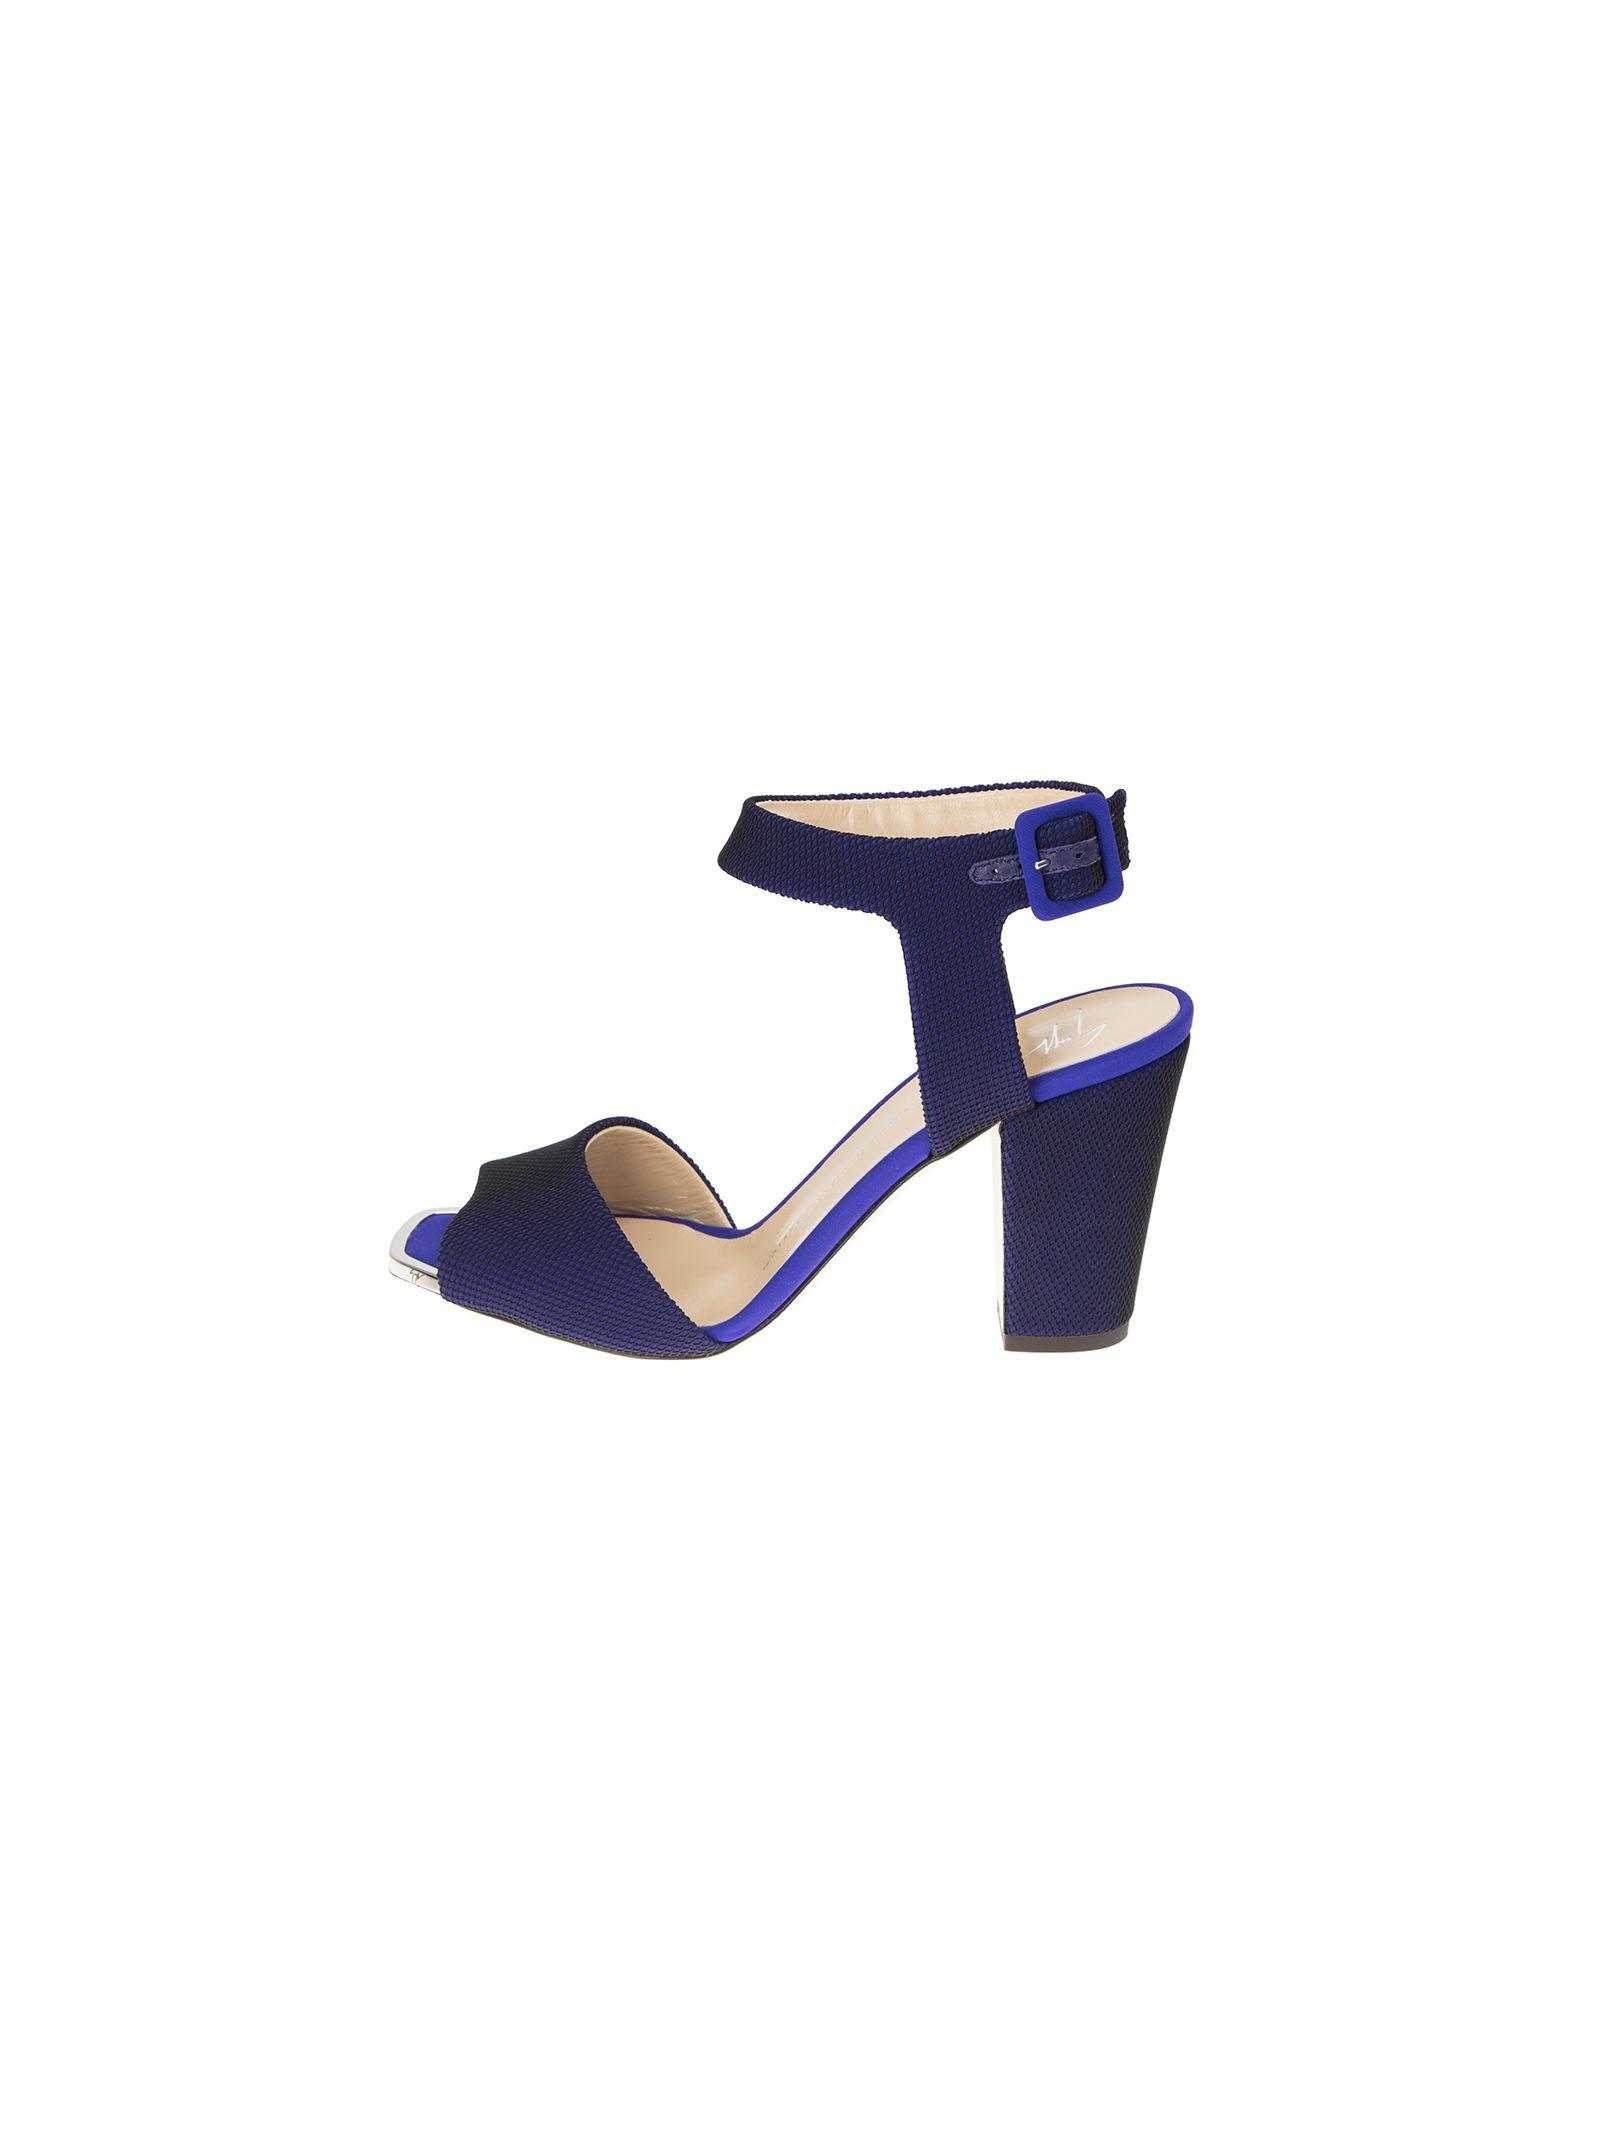 giuseppe zanotti female bluette and black leather sandals lavinia